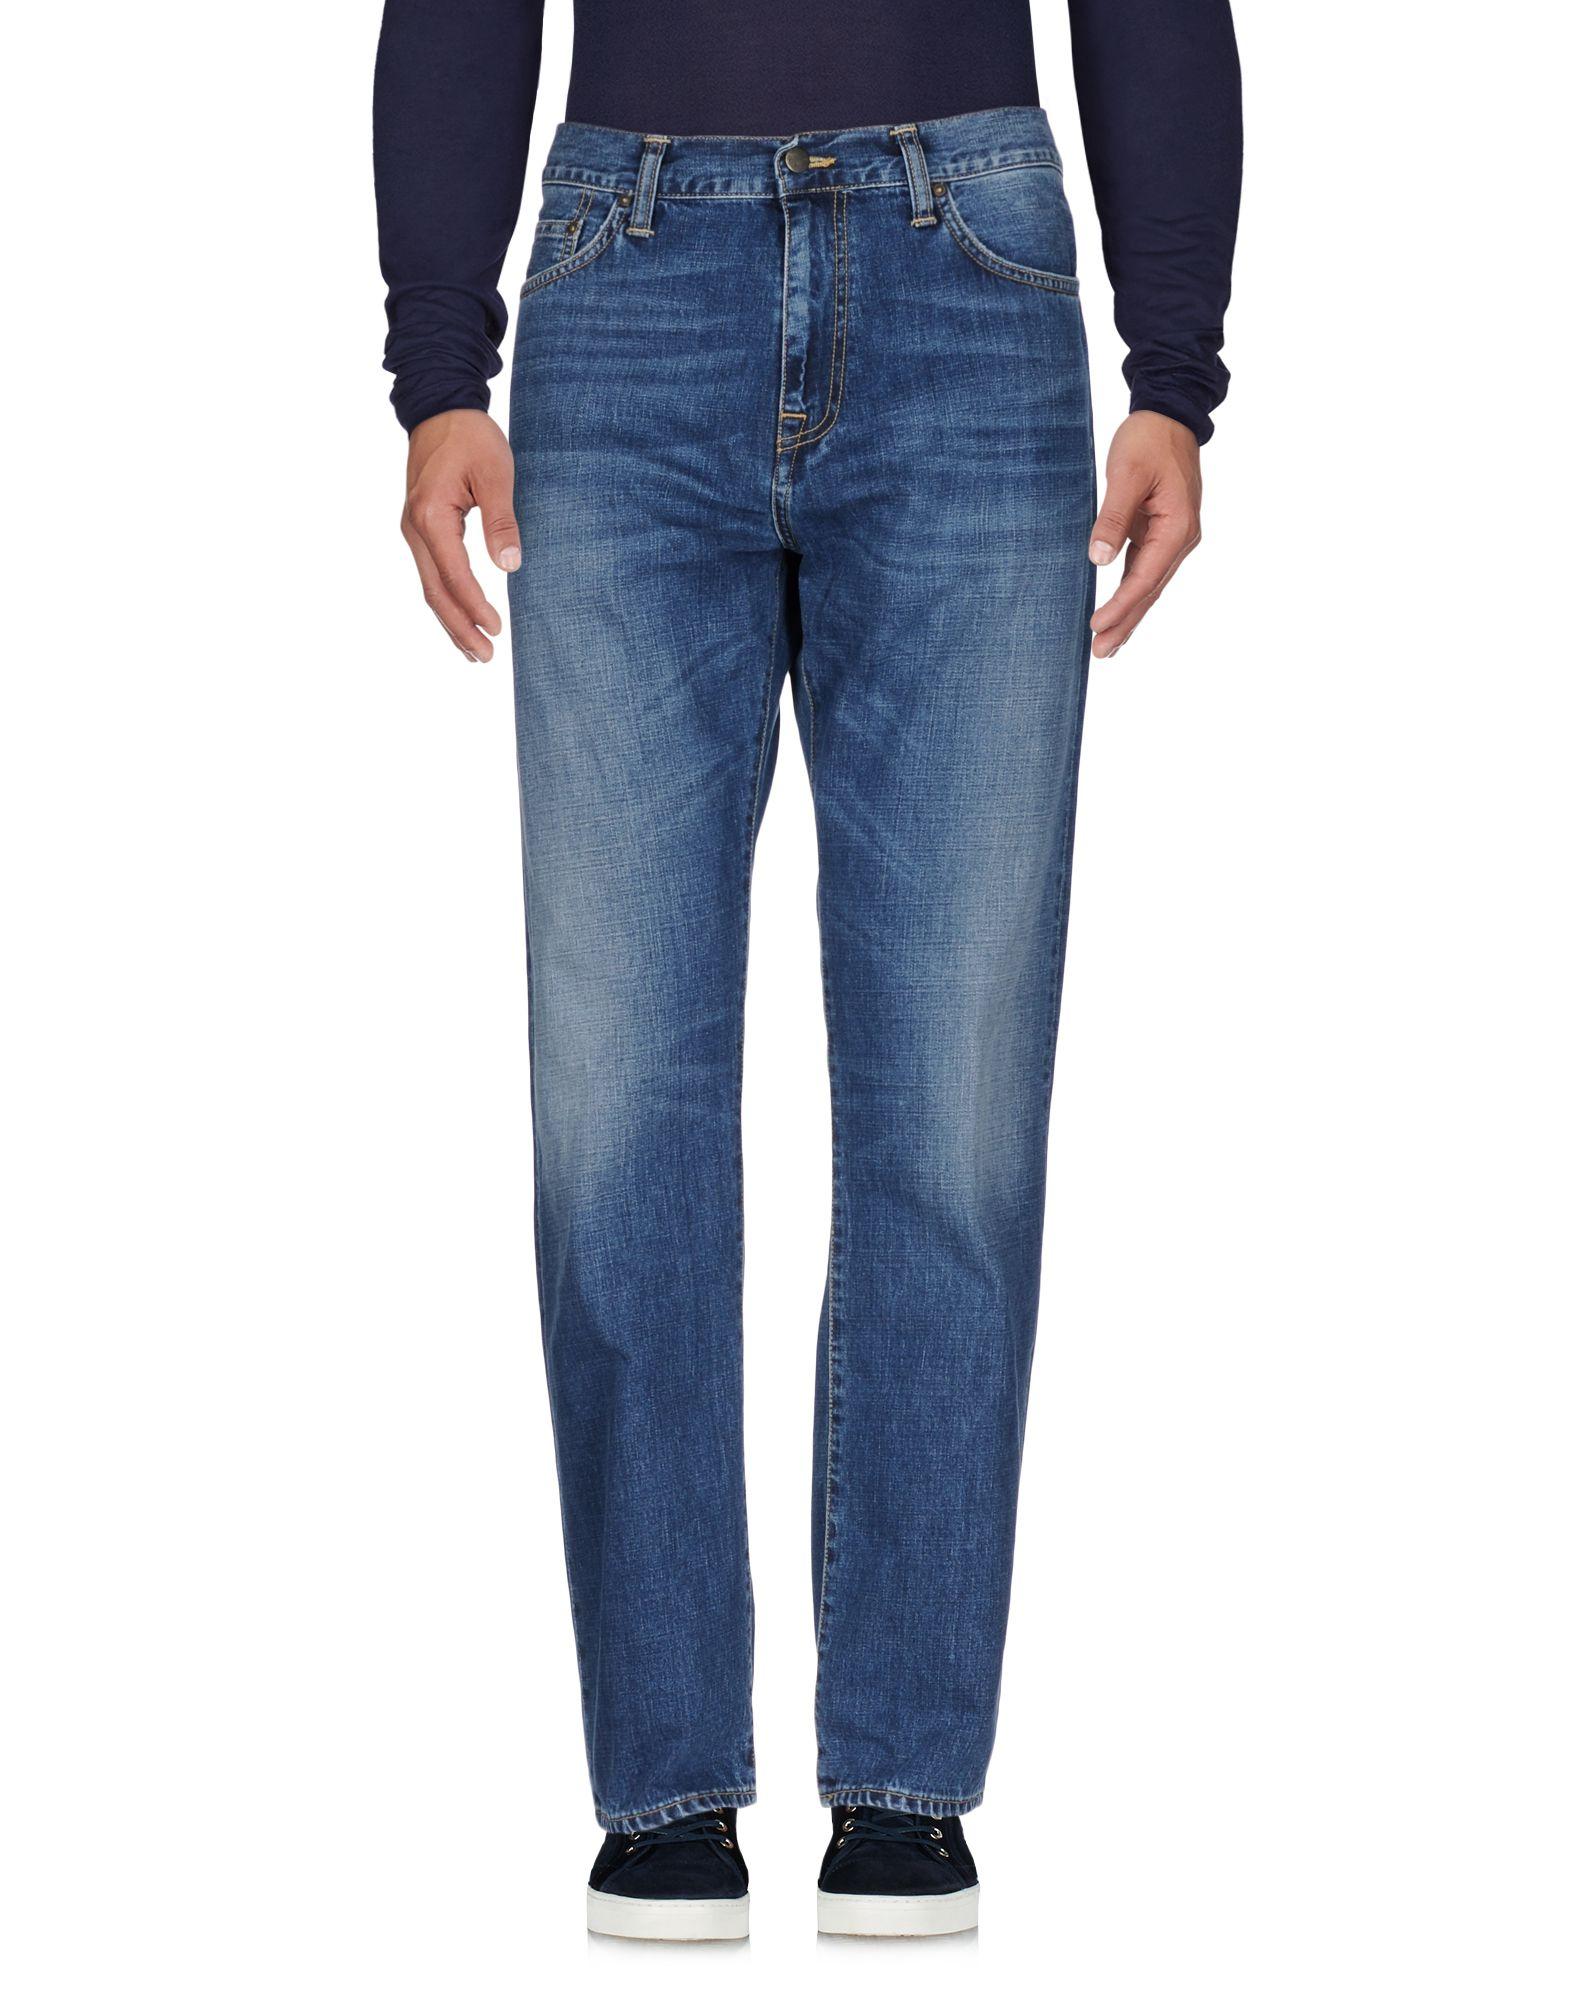 Pantaloni - Jeans Carhartt Uomo - Pantaloni 42605286OC 289219